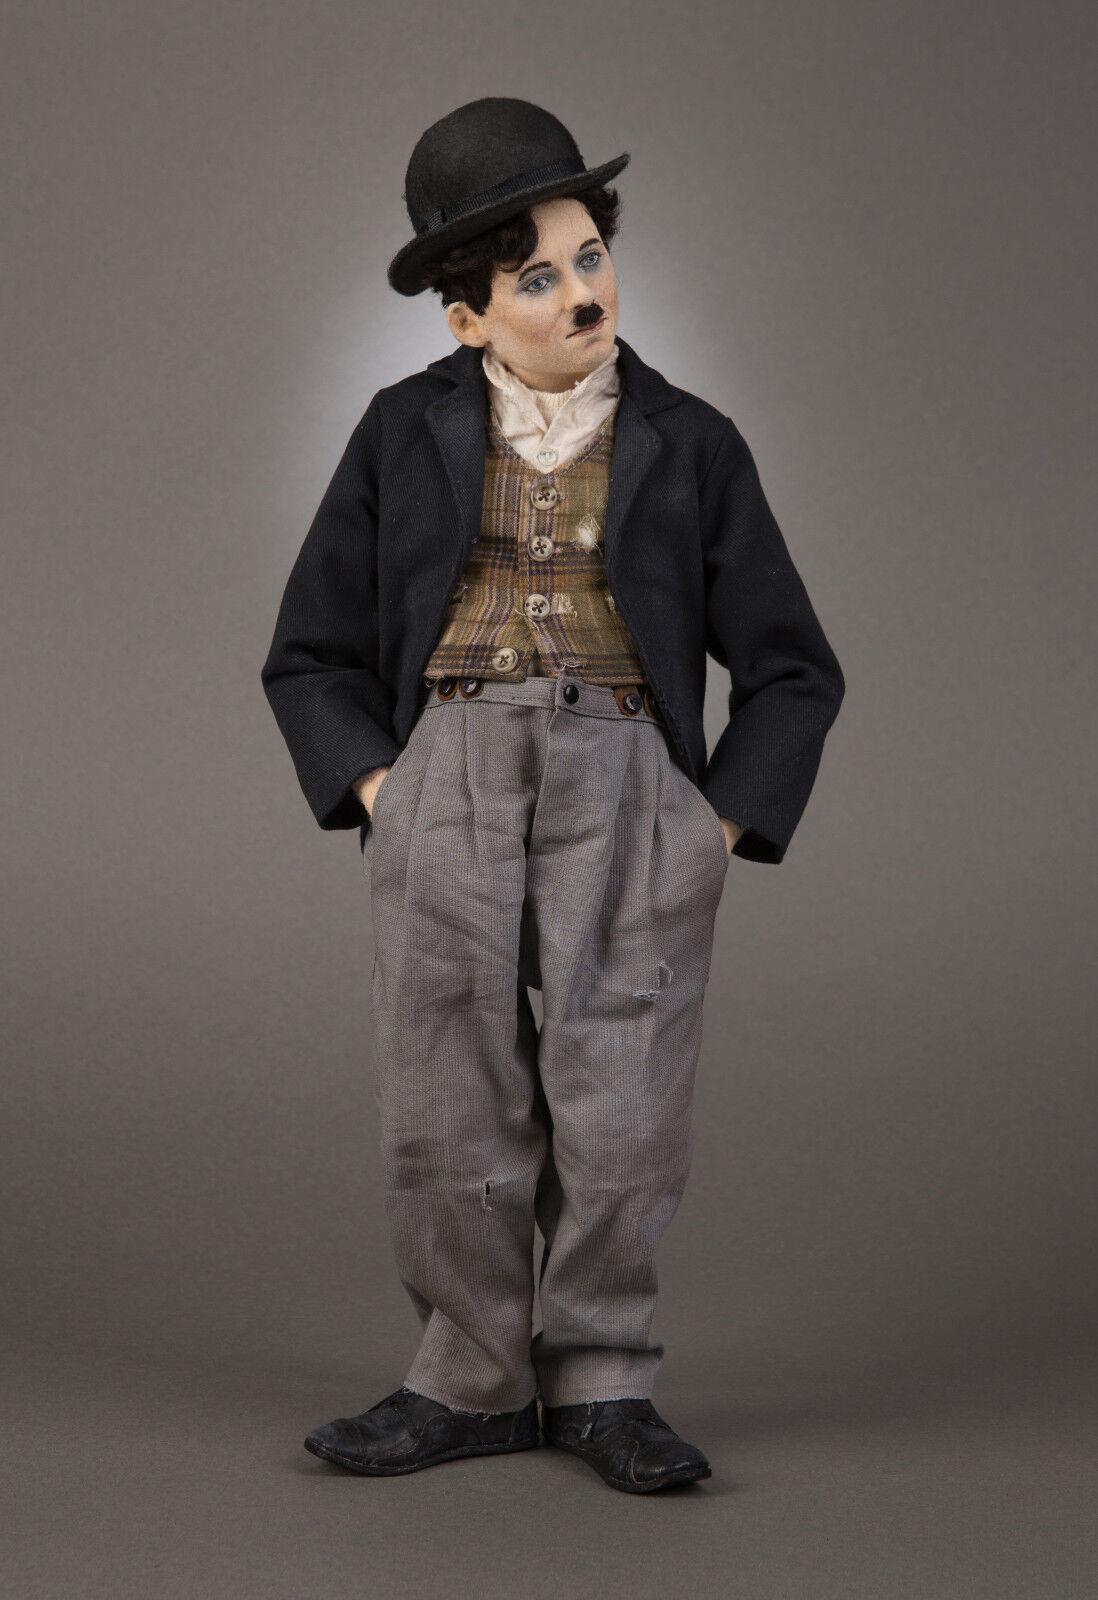 R John Wright-Charlie Chaplin Muñeca solamente-sin restos de perro